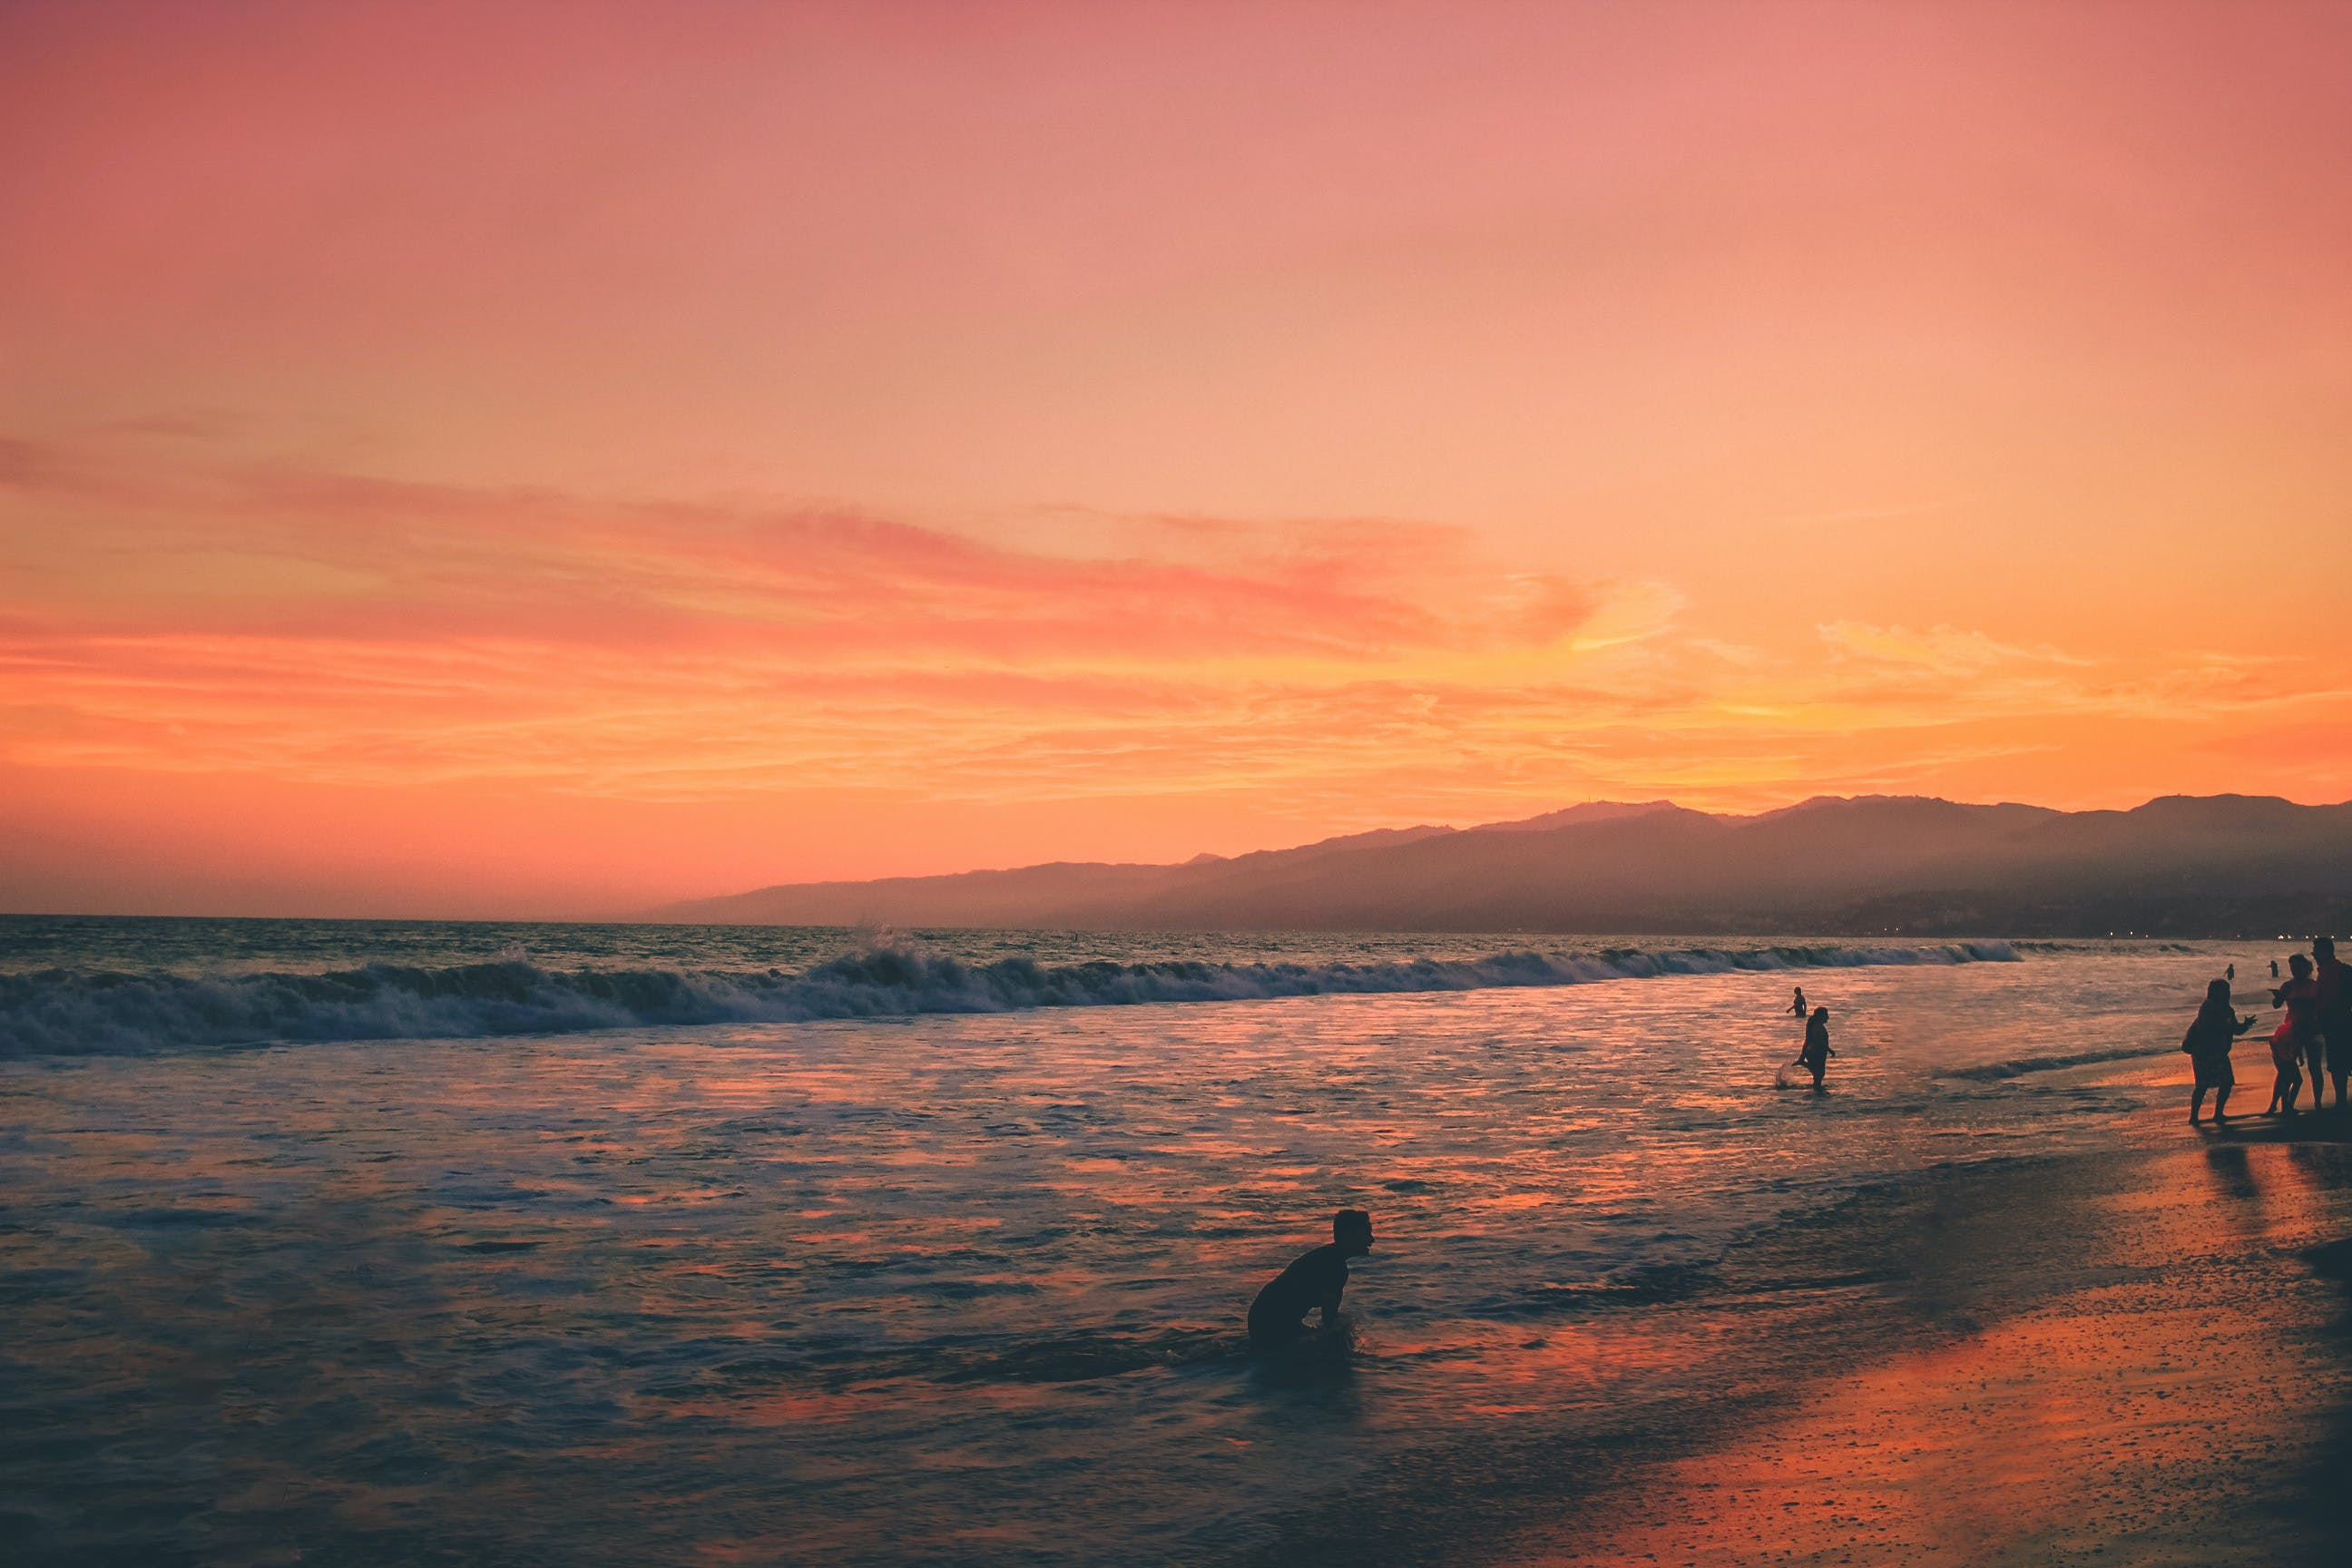 Photo of People On Seashore During Sunset